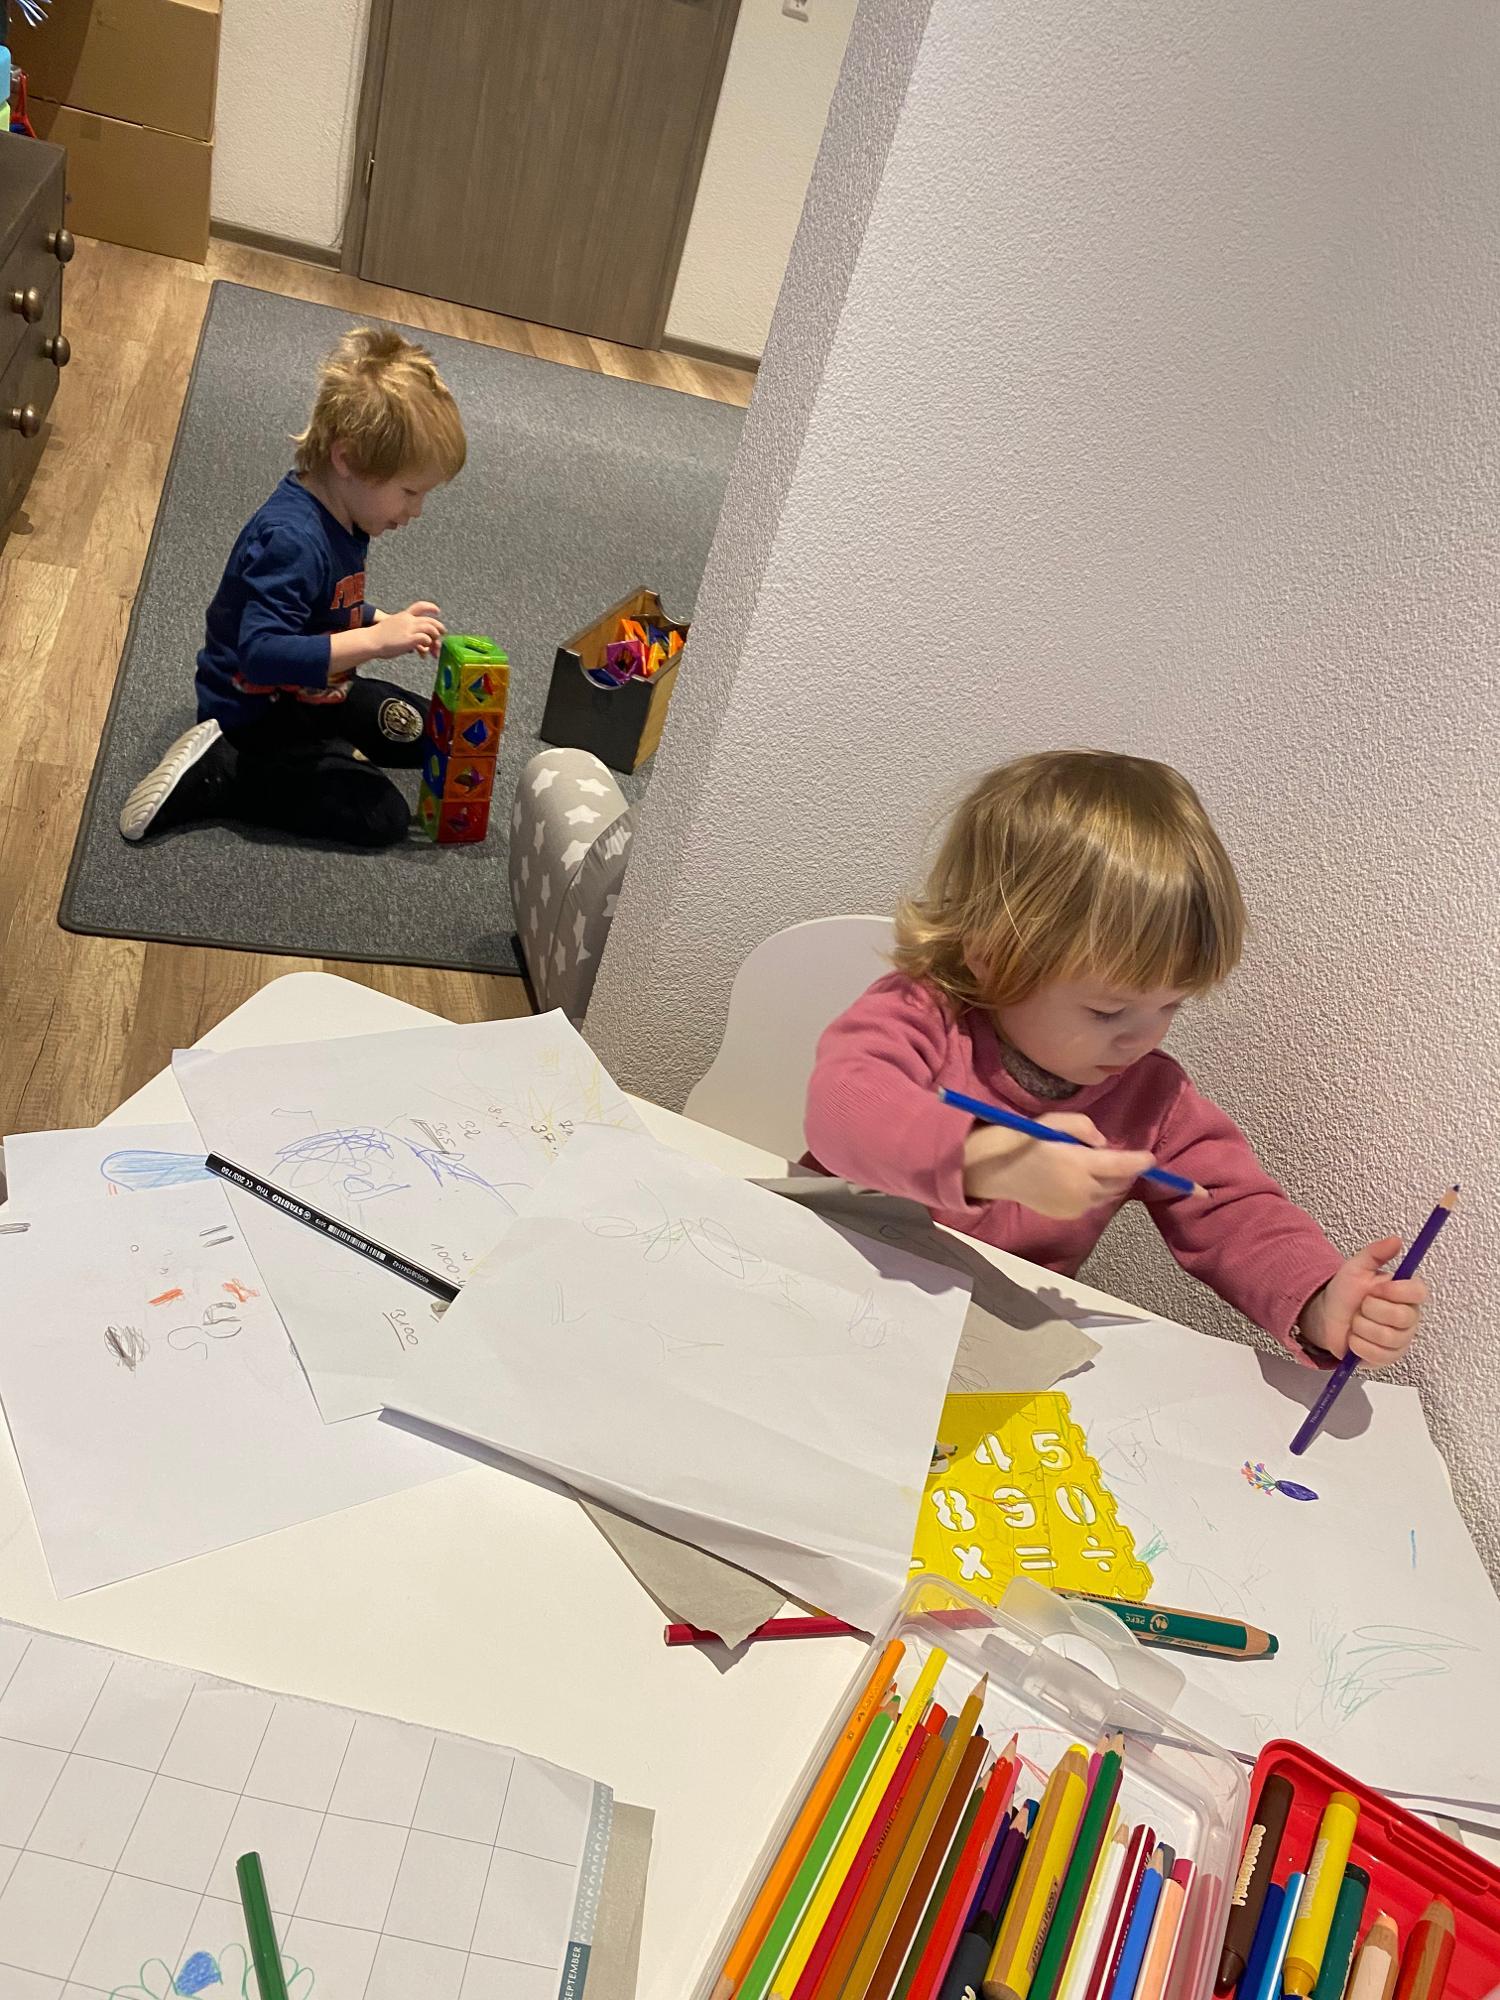 Kinderstube Siedler Kindertagespflege